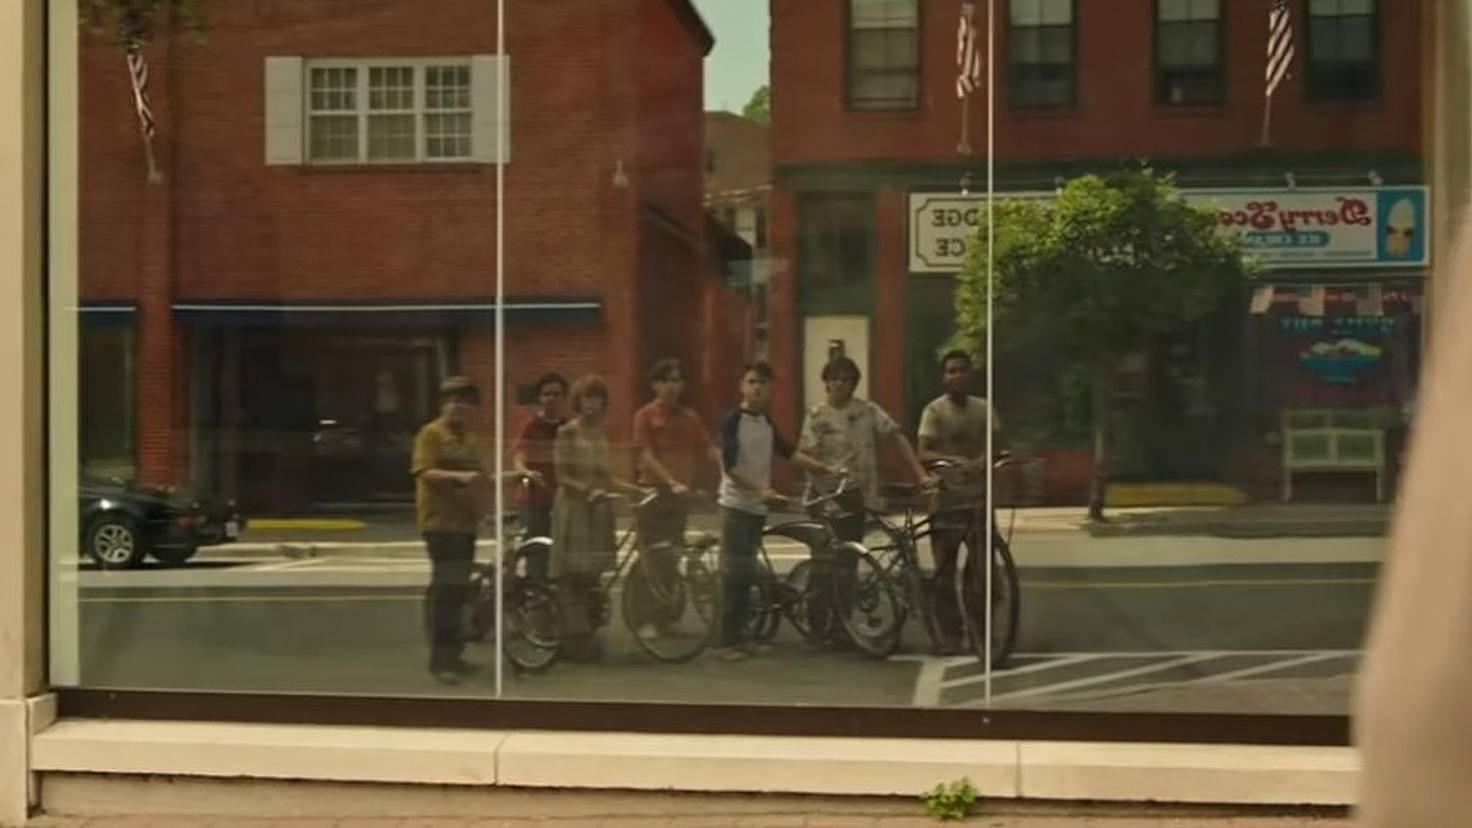 It Chapter 2-Losers Mirror Image-Youtube-Warner Bros DE